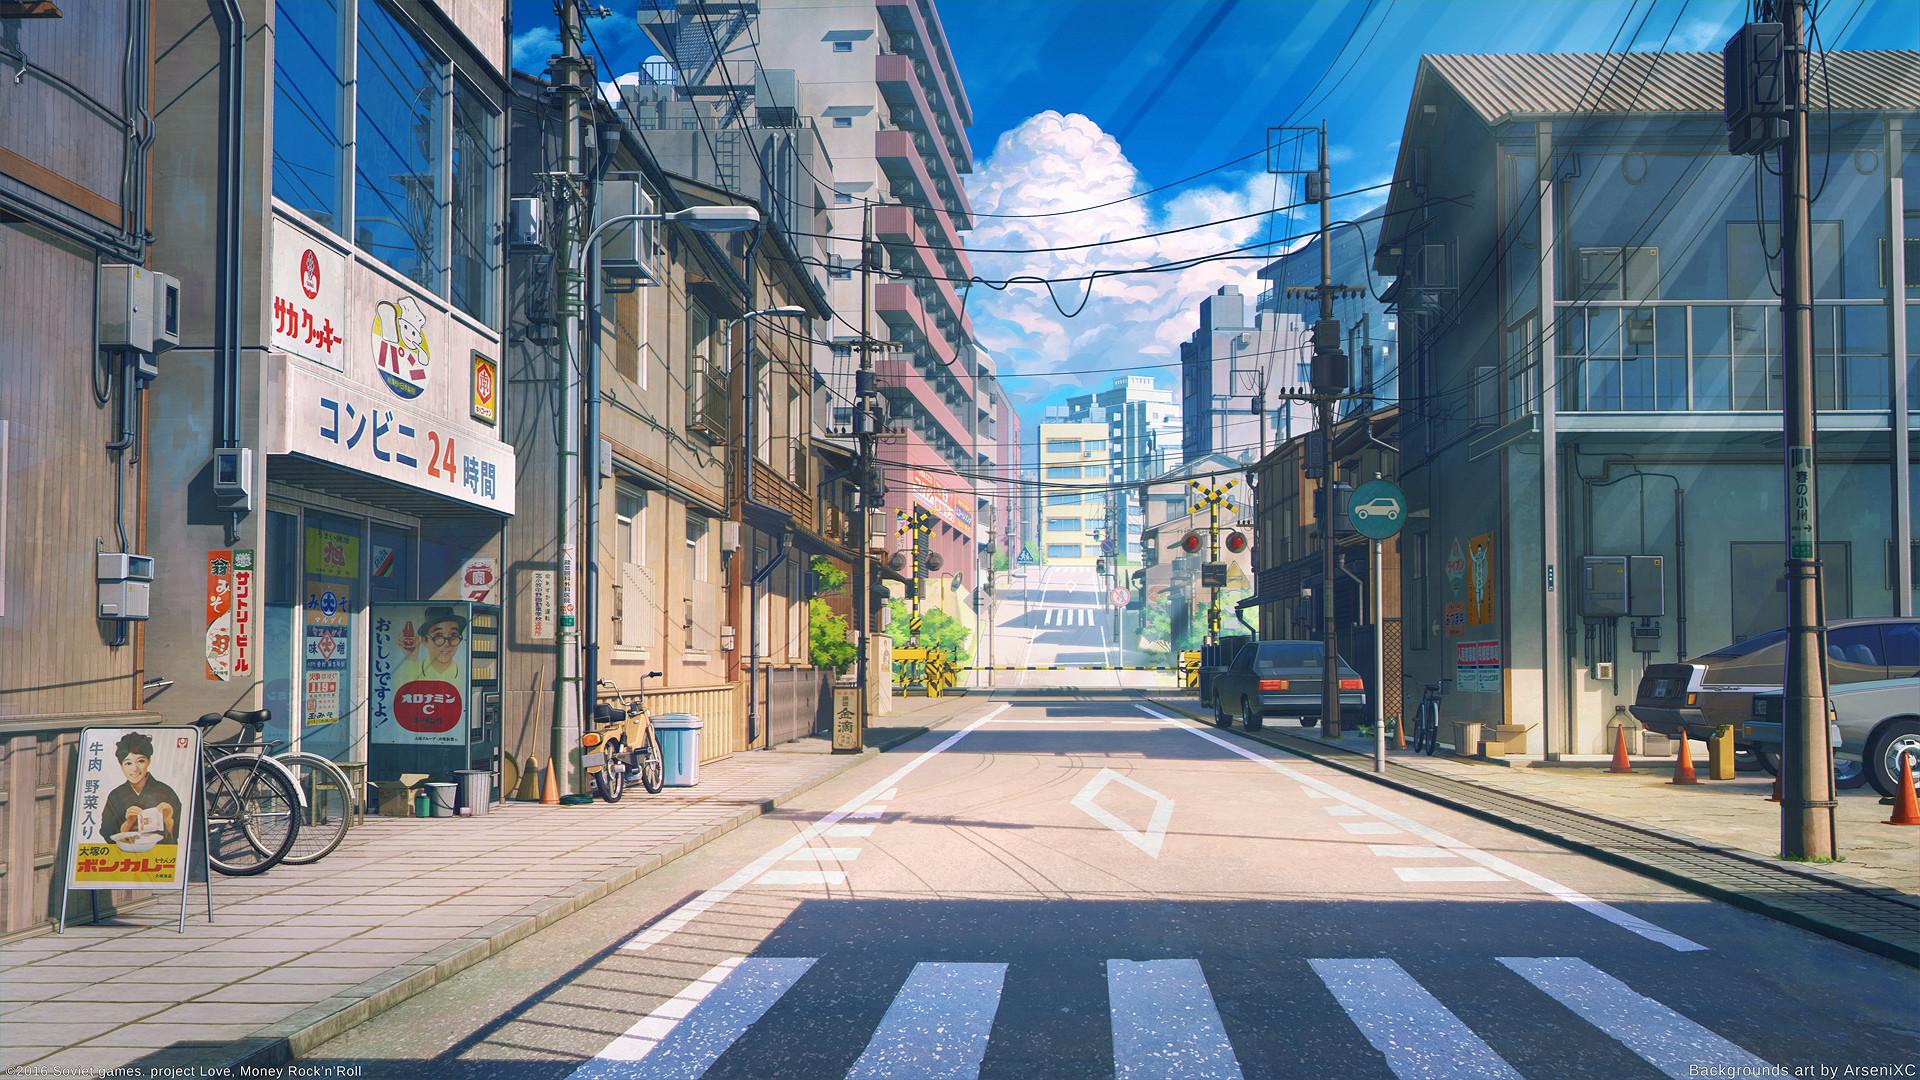 Wallpaper japan tokyo street building bicycle crosswalk digital art house sign clouds - Hd wallpapers 10000x10000 ...